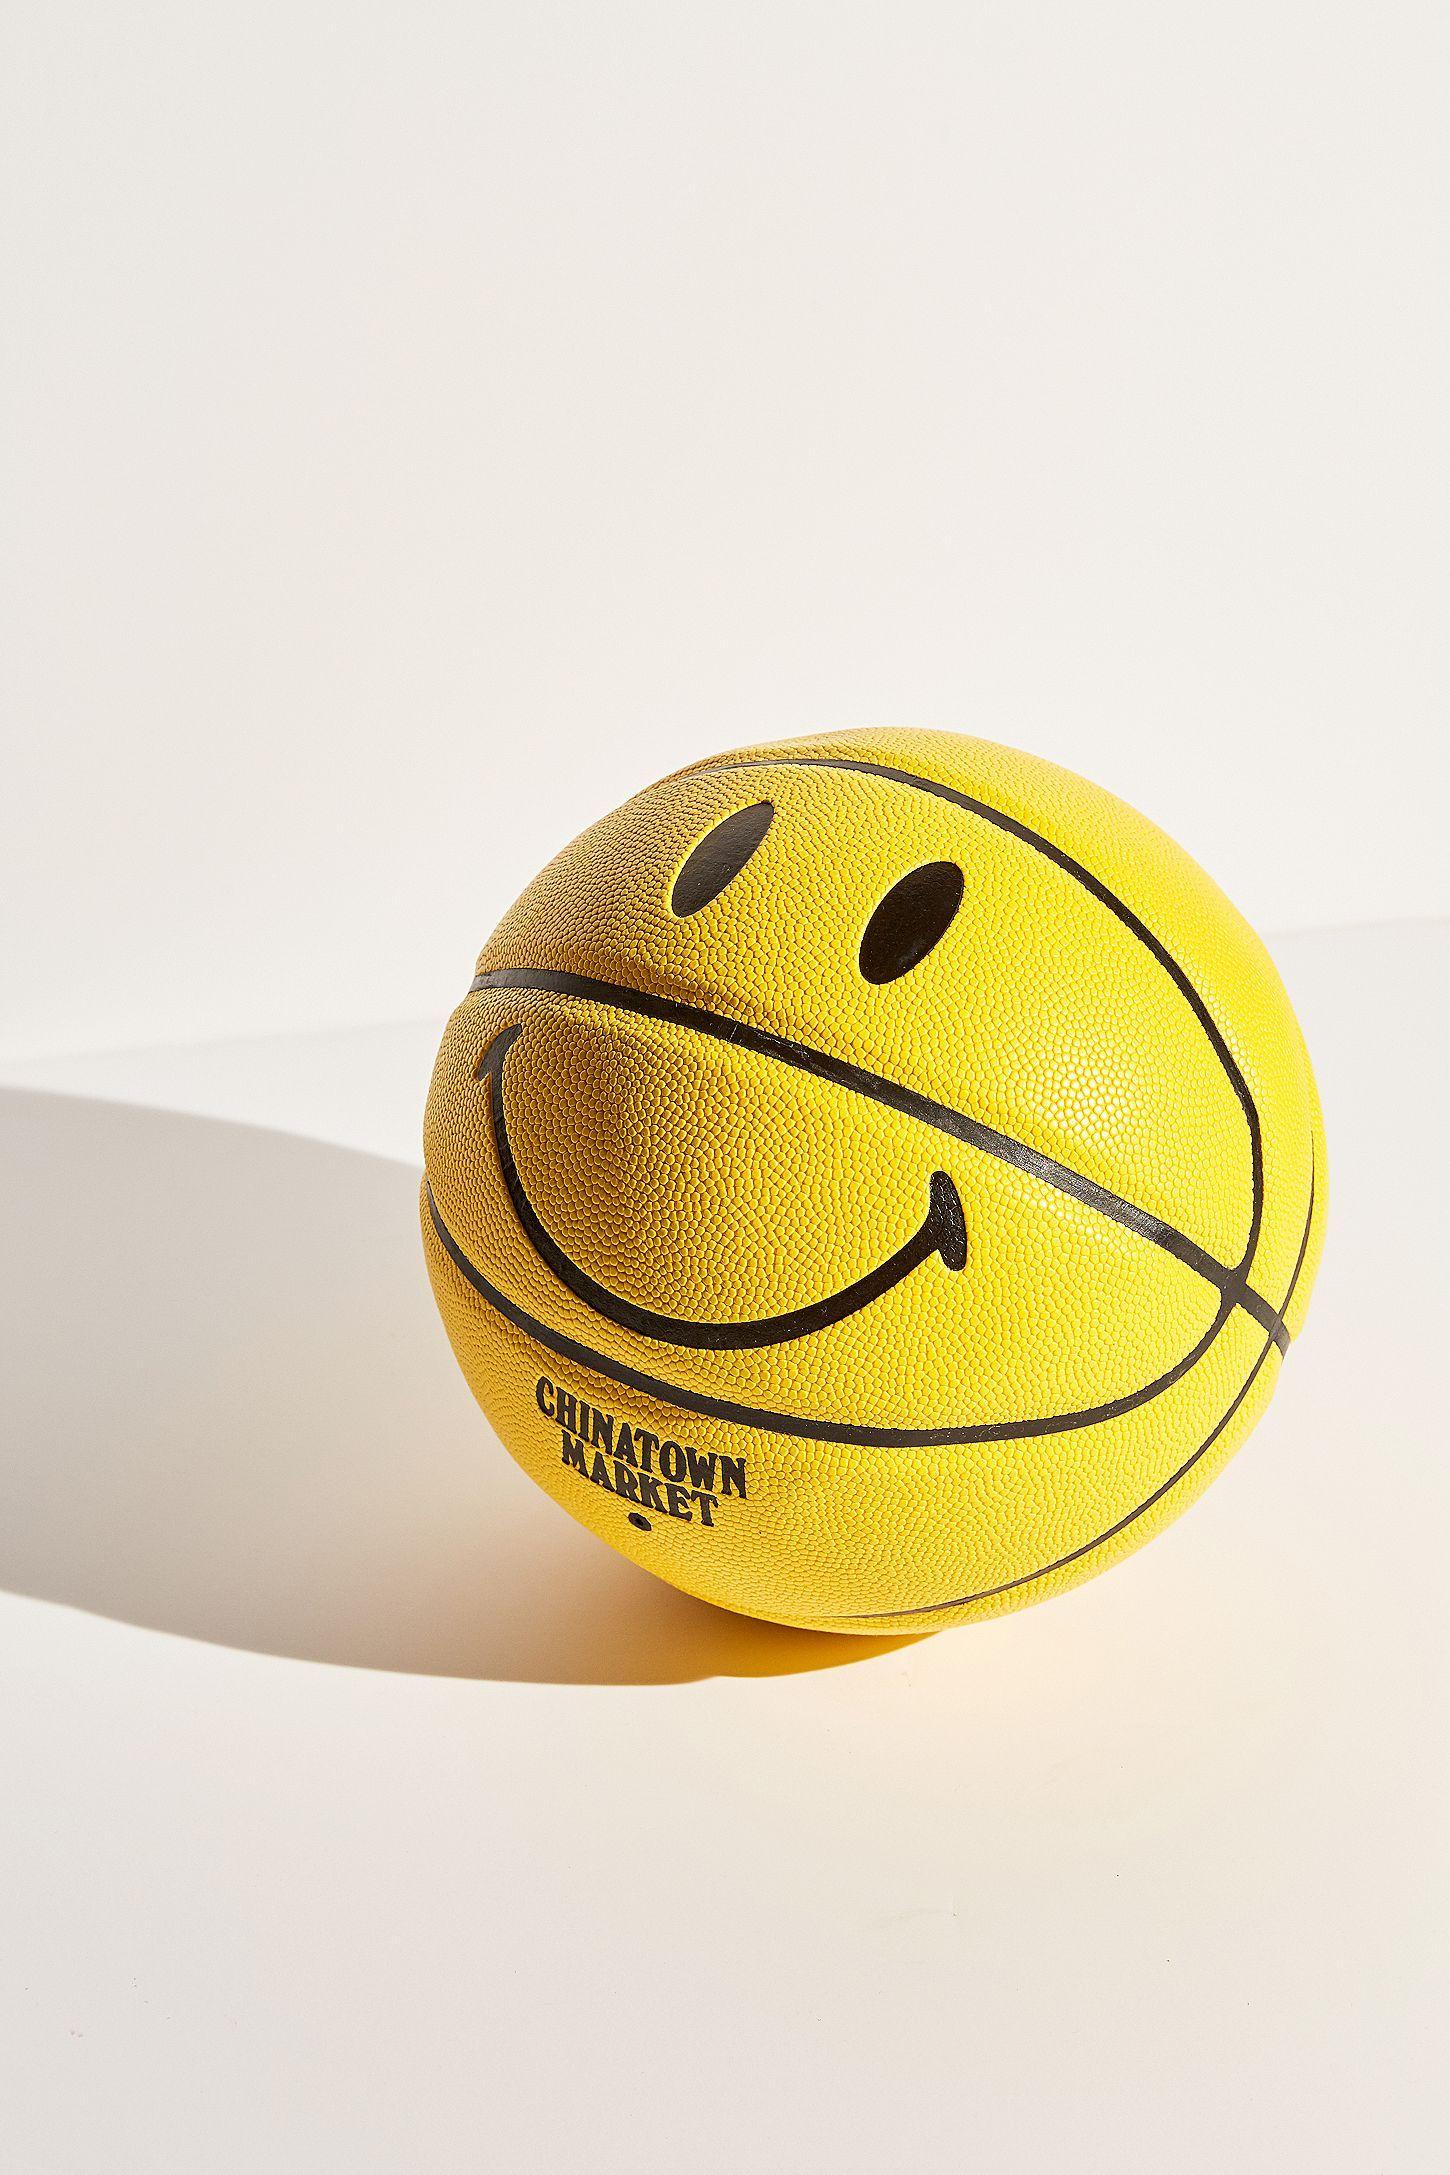 Chinatown Market X Smiley Uo Exclusive Smiley Basketball Basketball Workouts Basketball Design Basketball